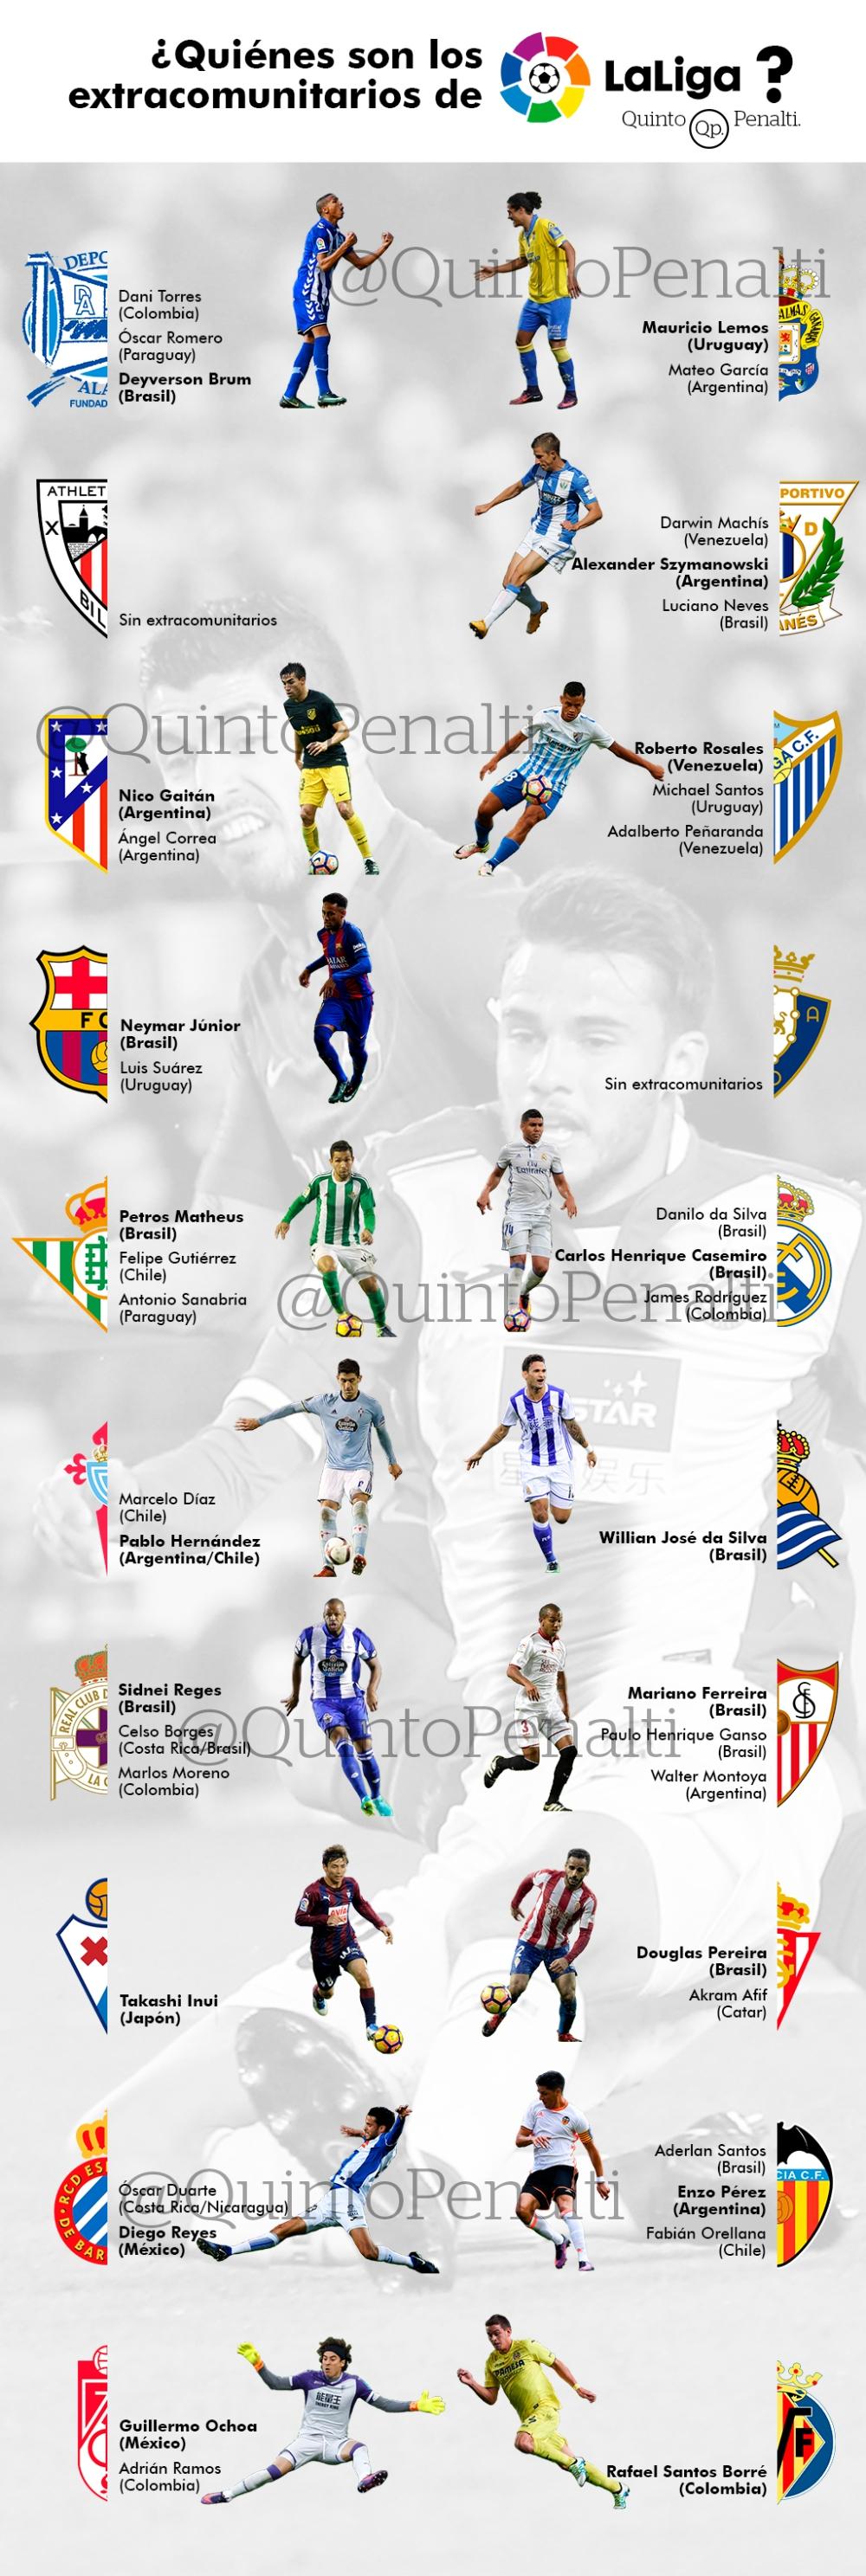 extracomunitarios liga 2016/17